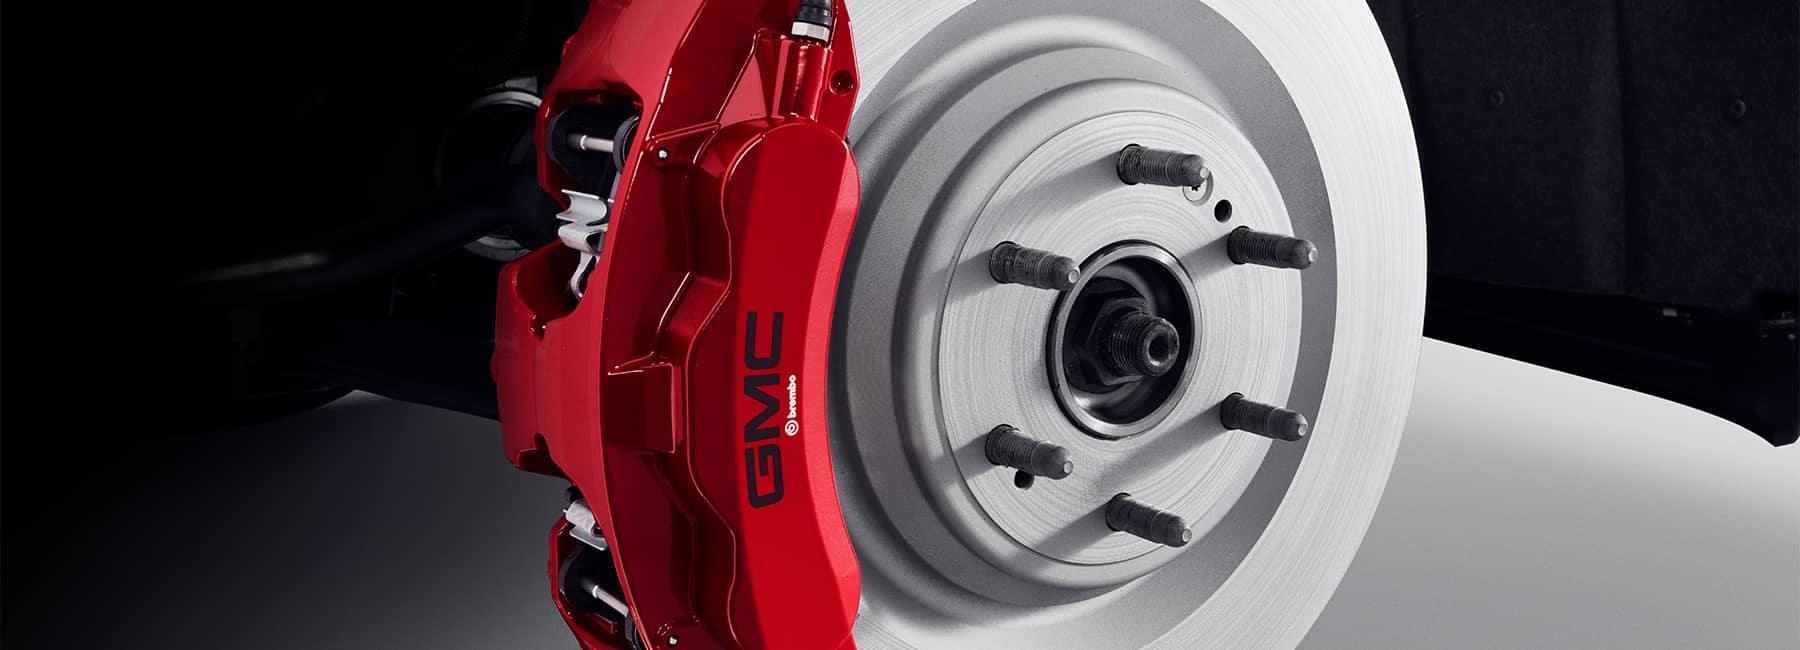 2021 GMC Yukon brakes